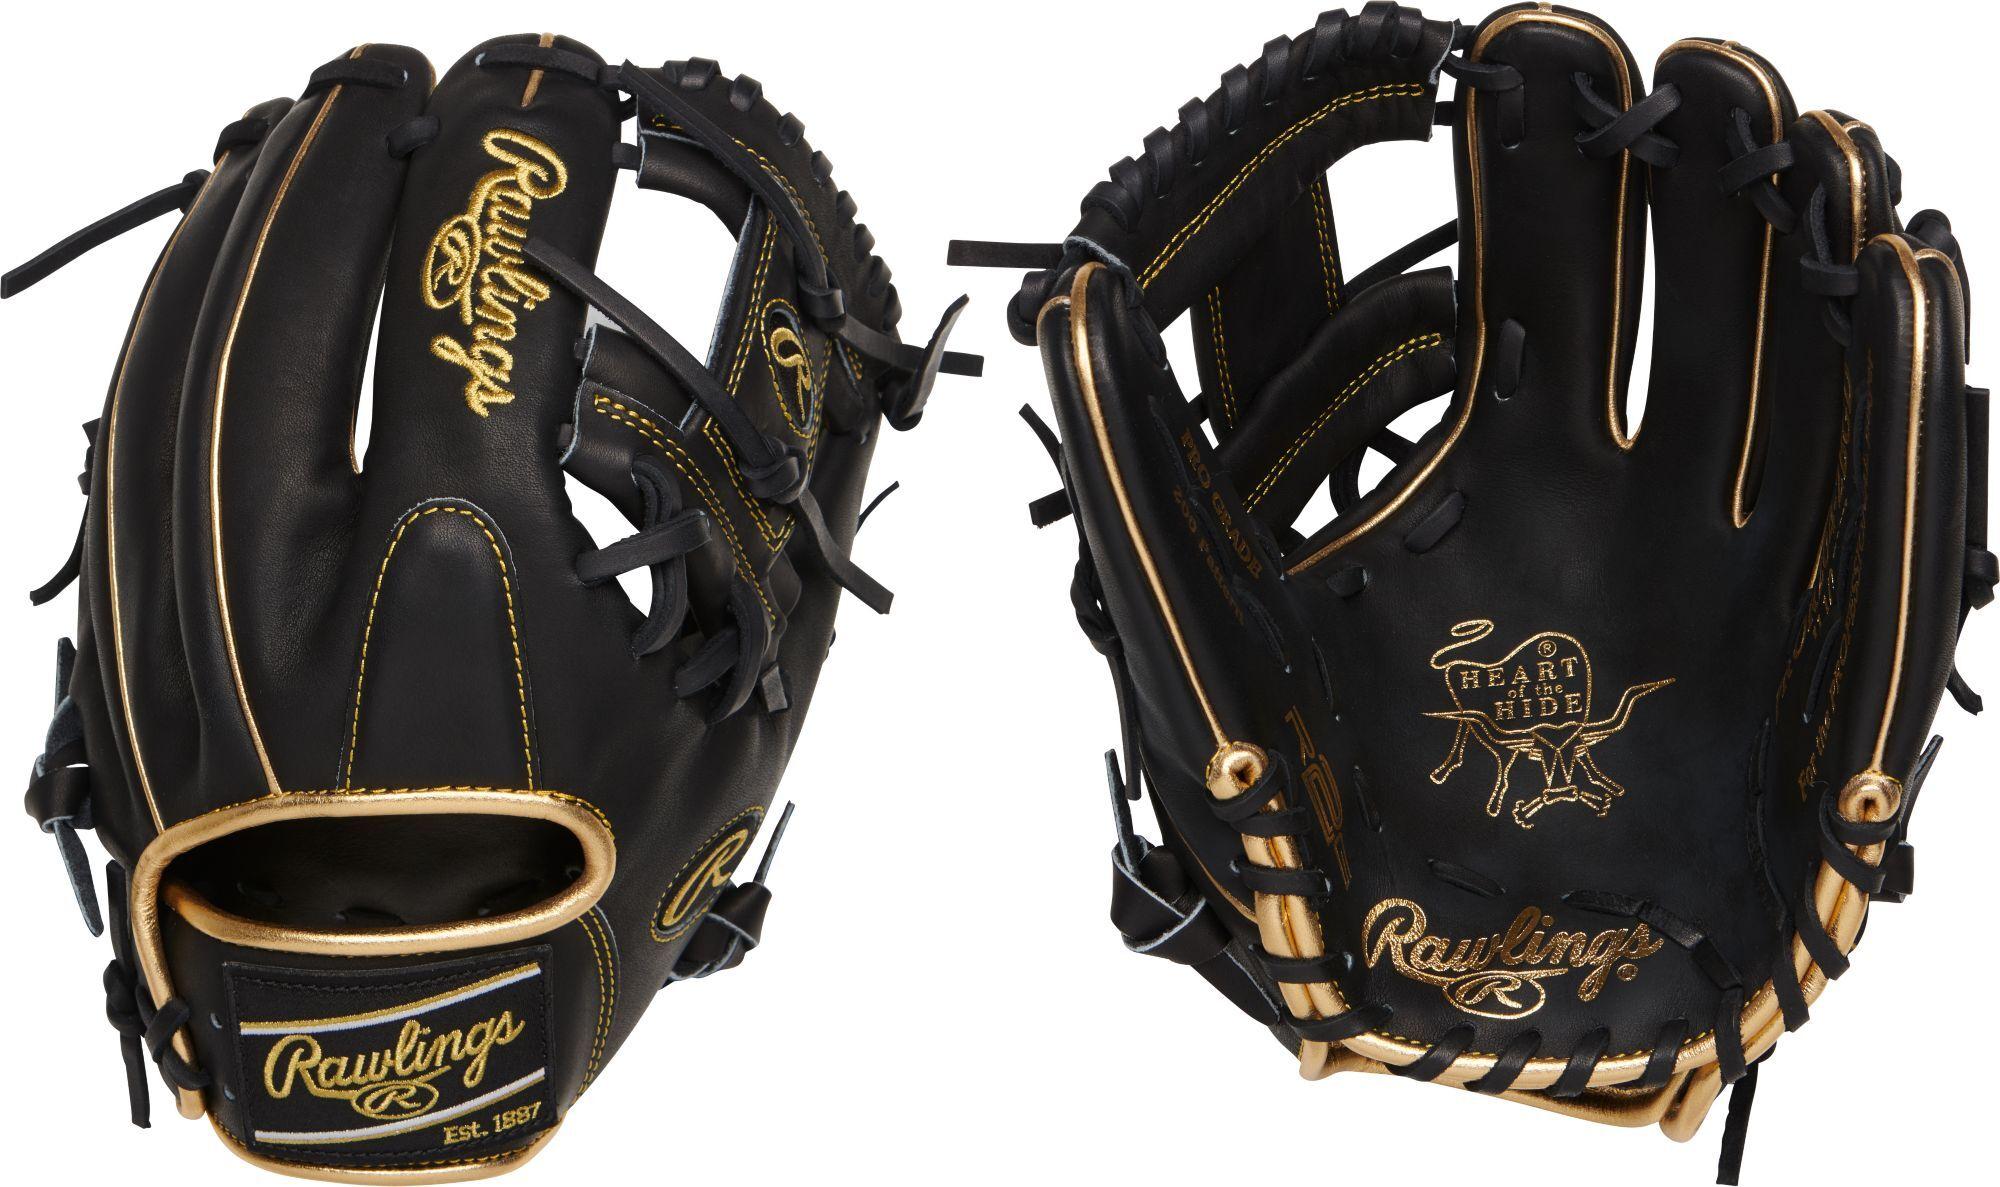 Rawlings 11.5'' HOH R2G Series Glove, Black